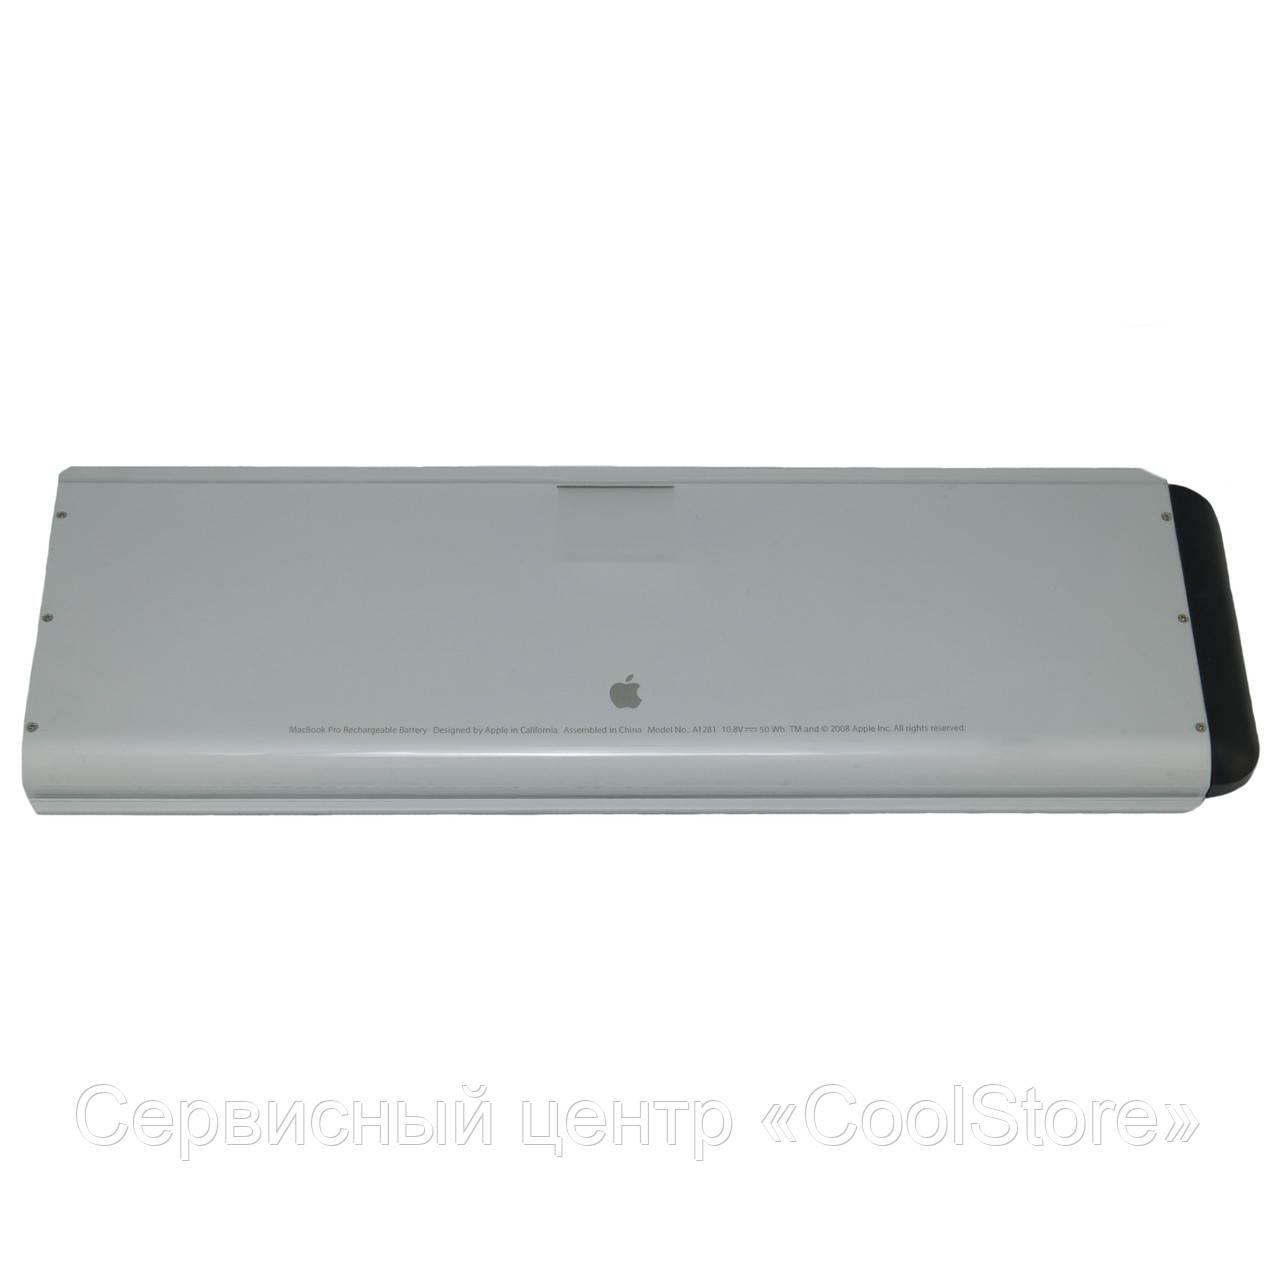 "Батарея A1281 для MacBook Pro 15"" 2008-2009гг. A1286"